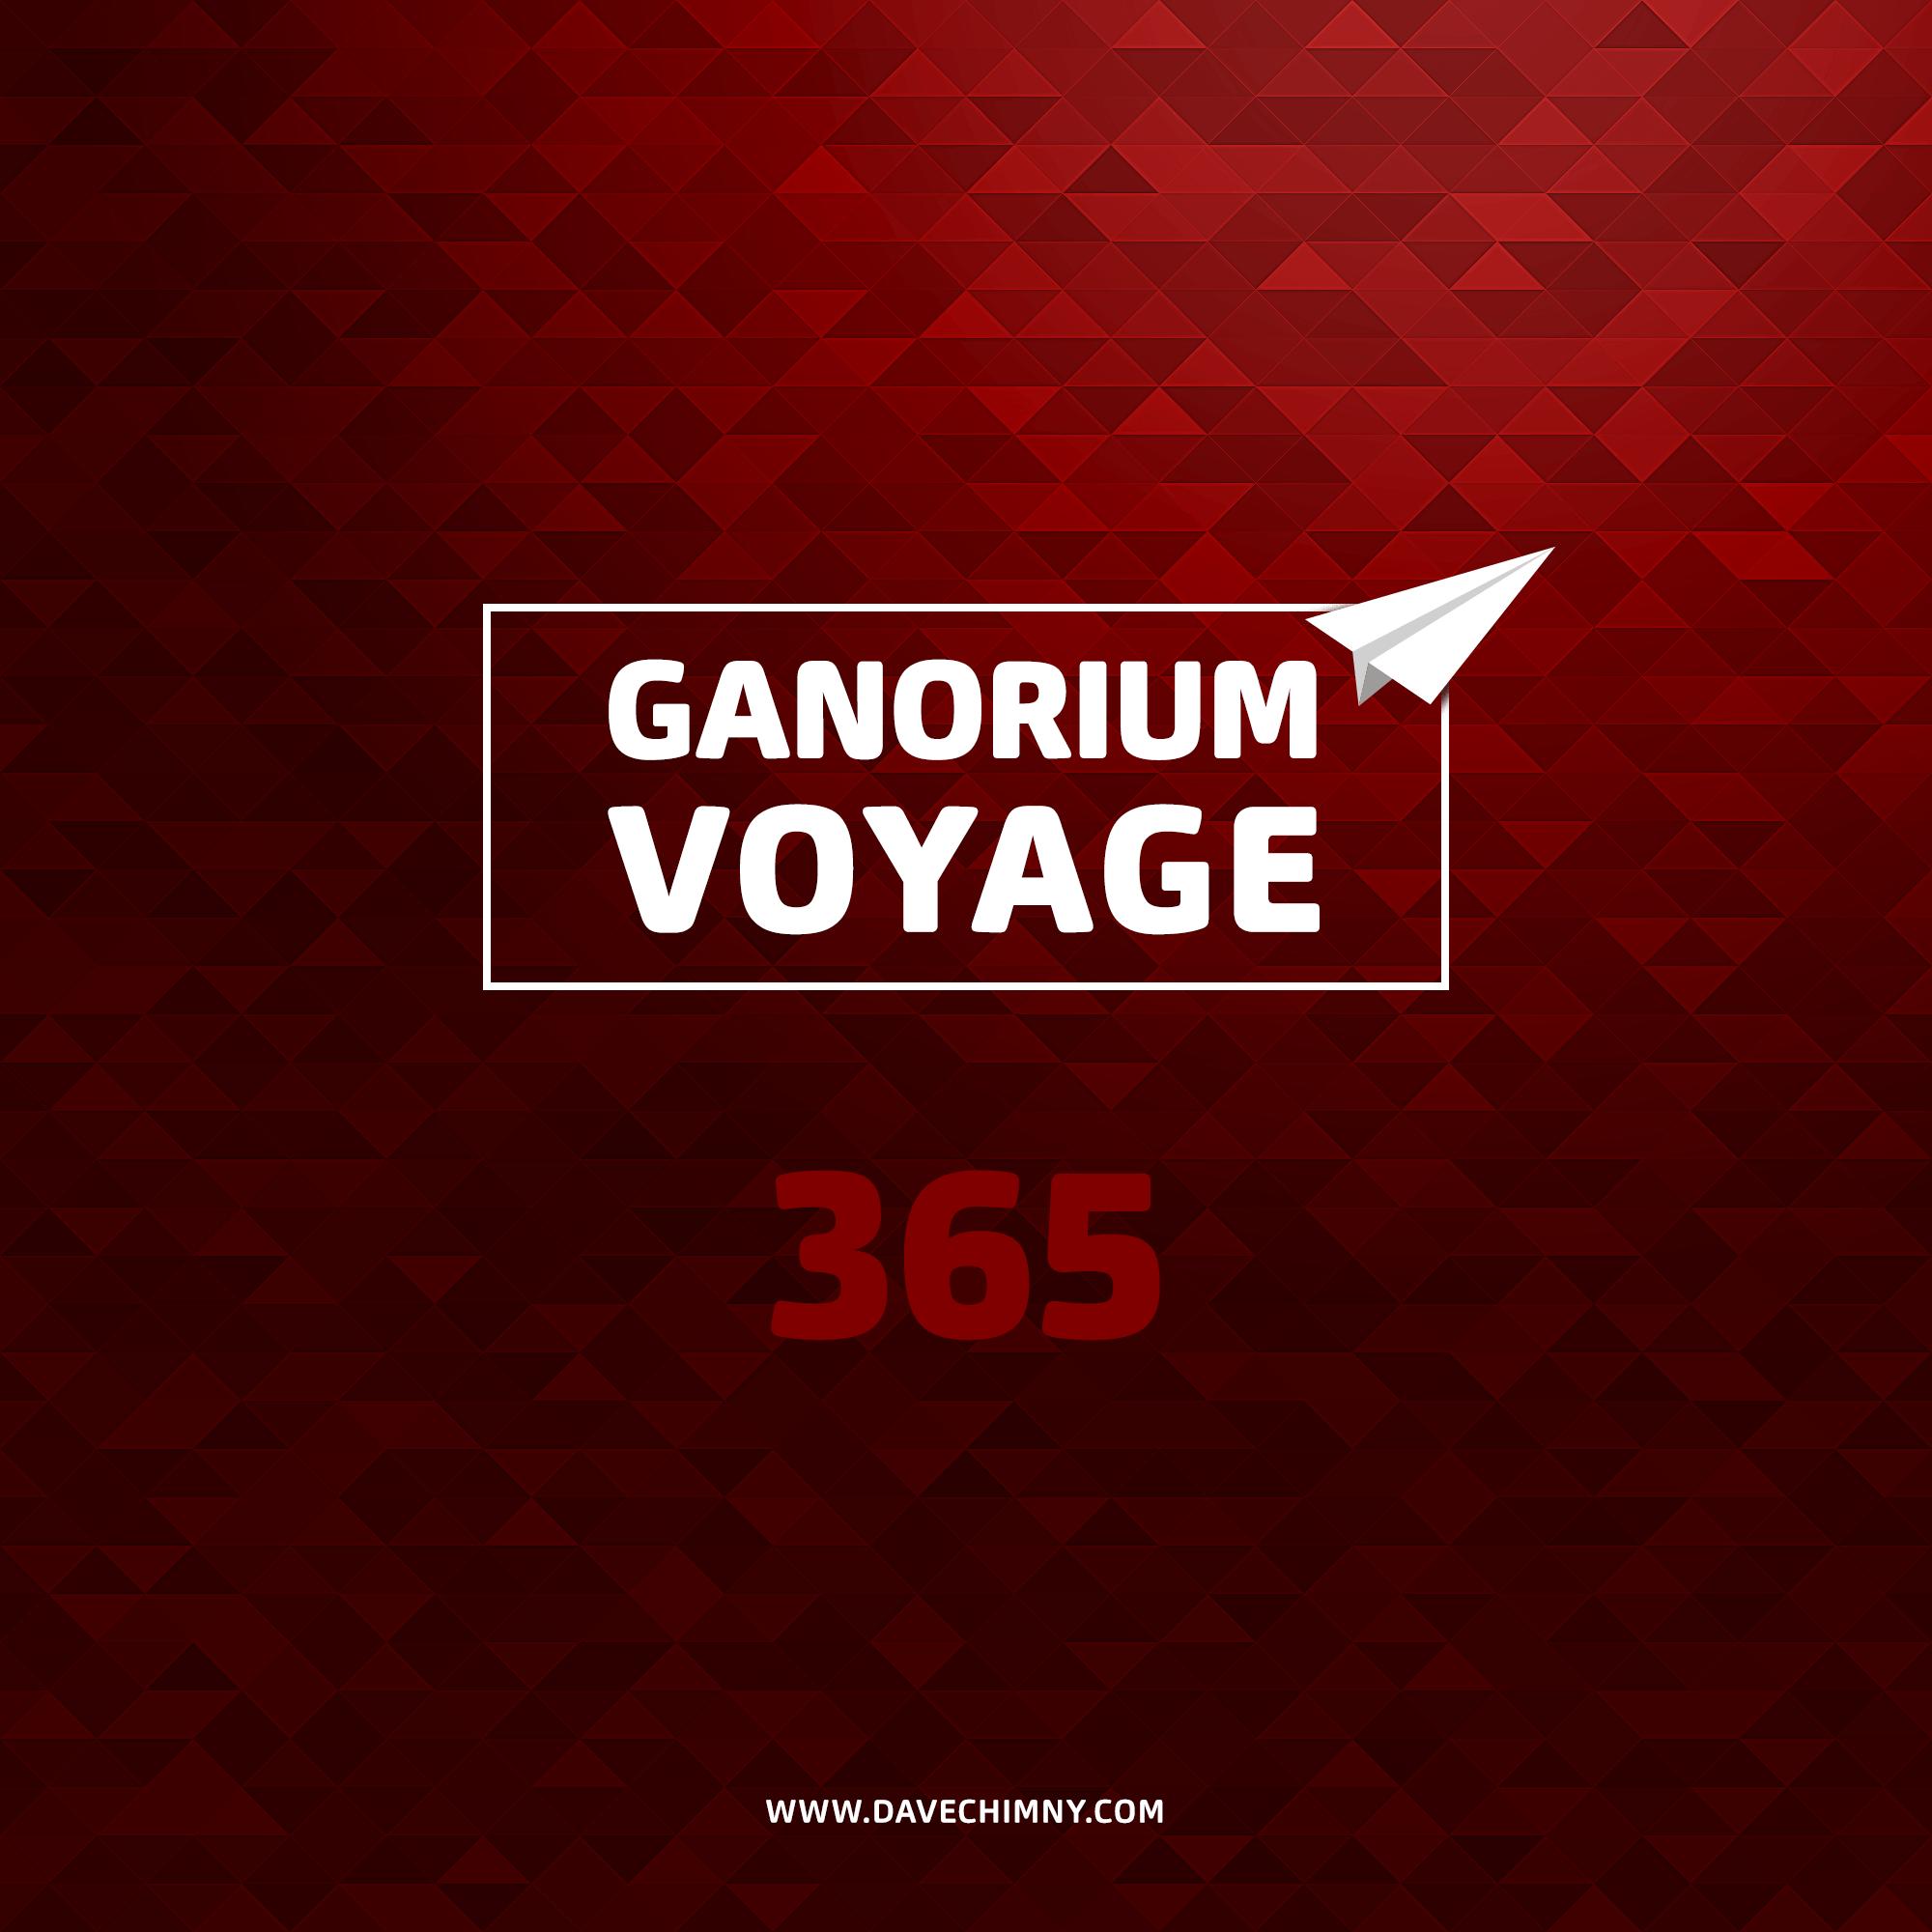 Dave Chimny – Ganorium Voyage 365